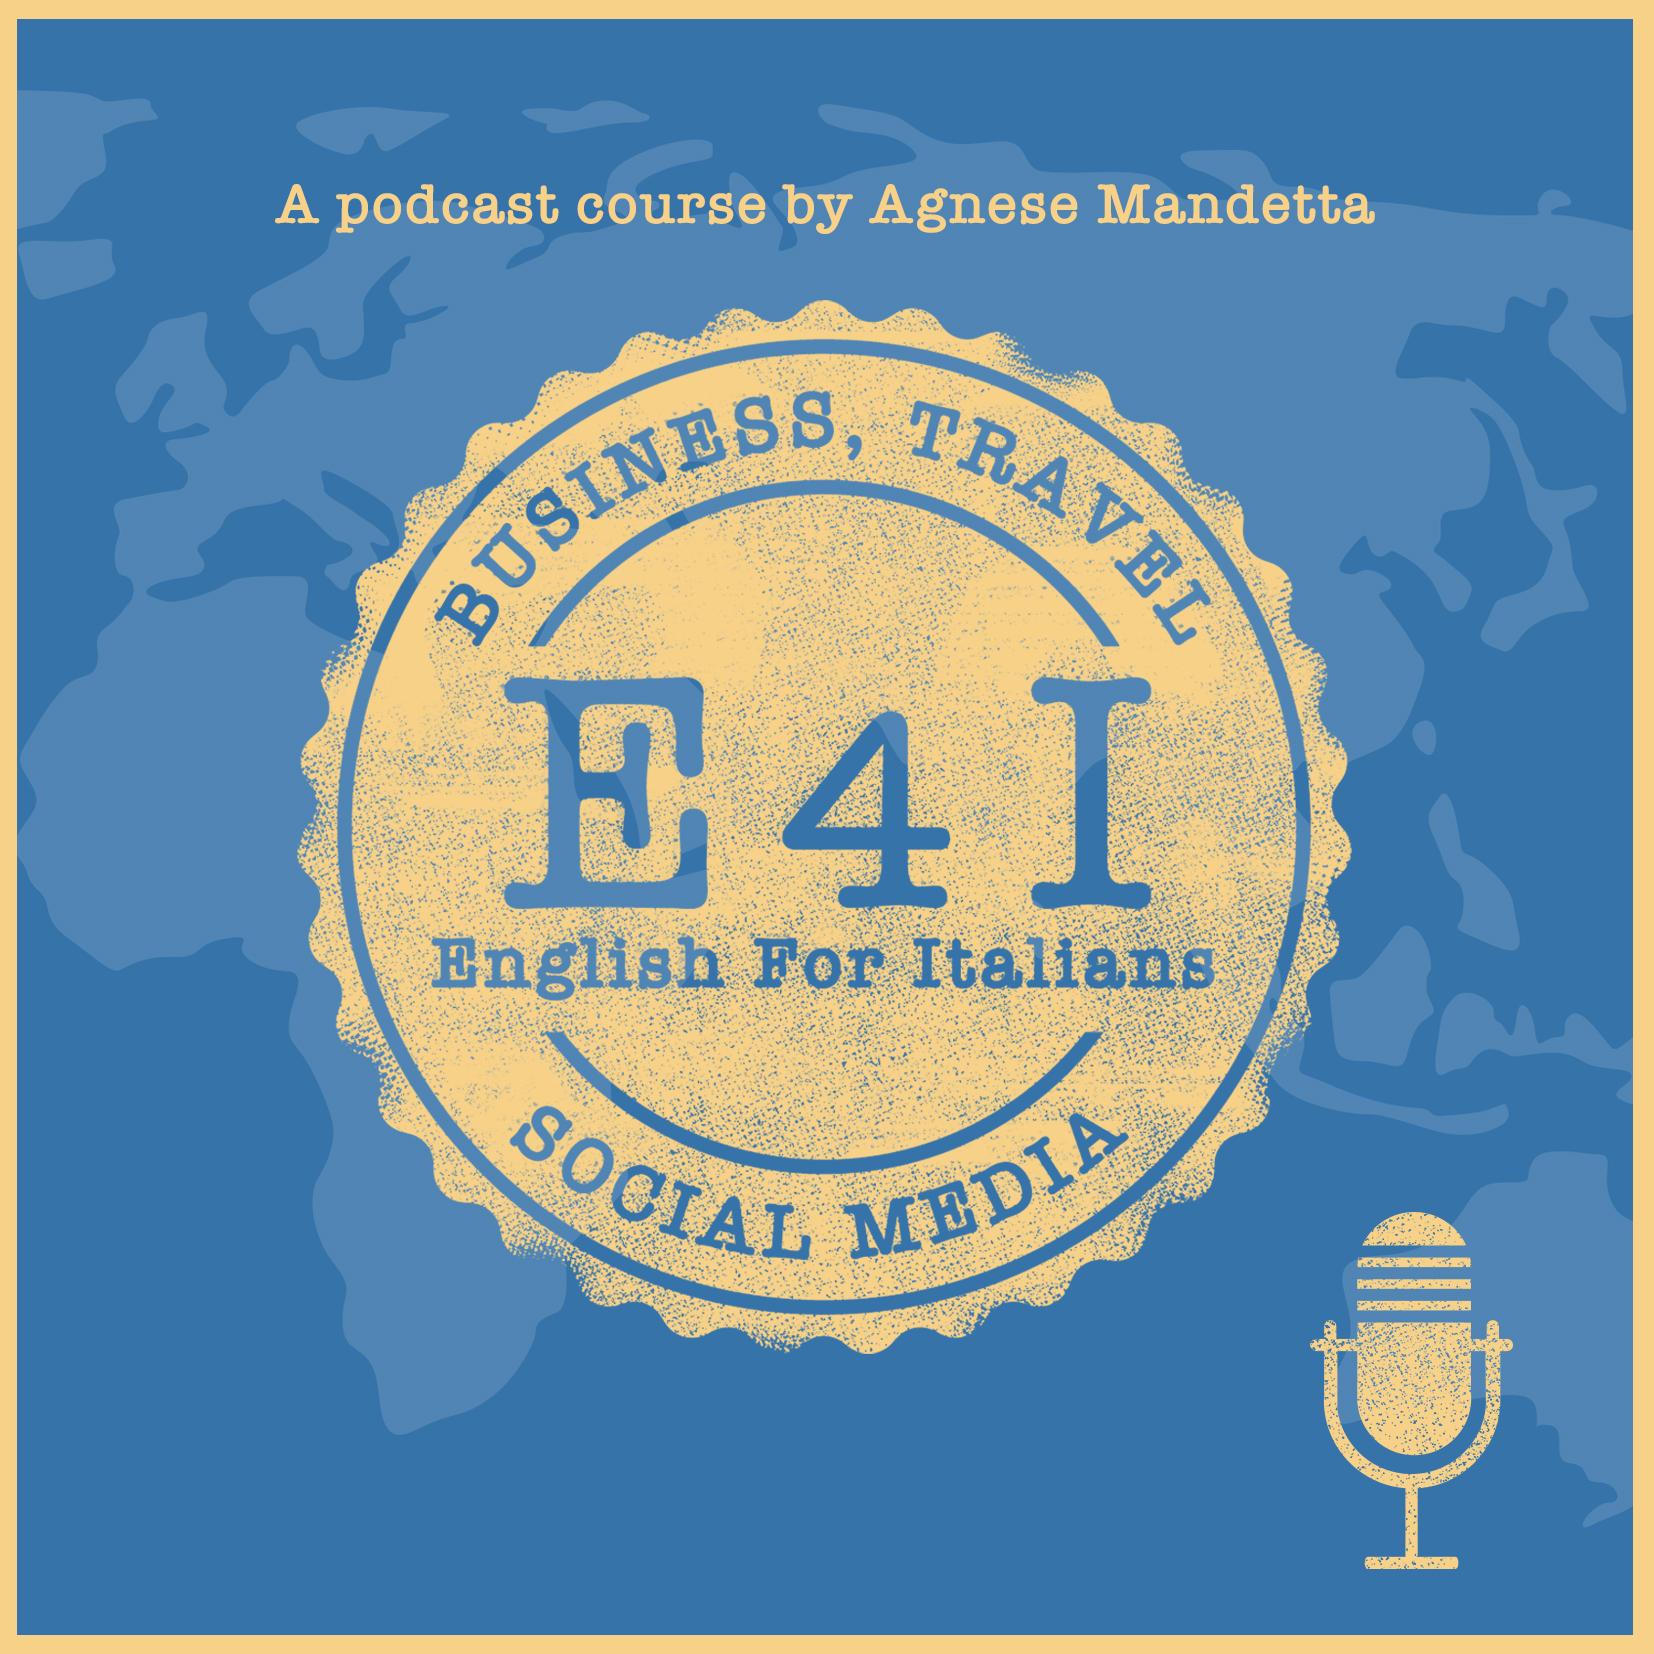 E4I English for Italians podcast cover